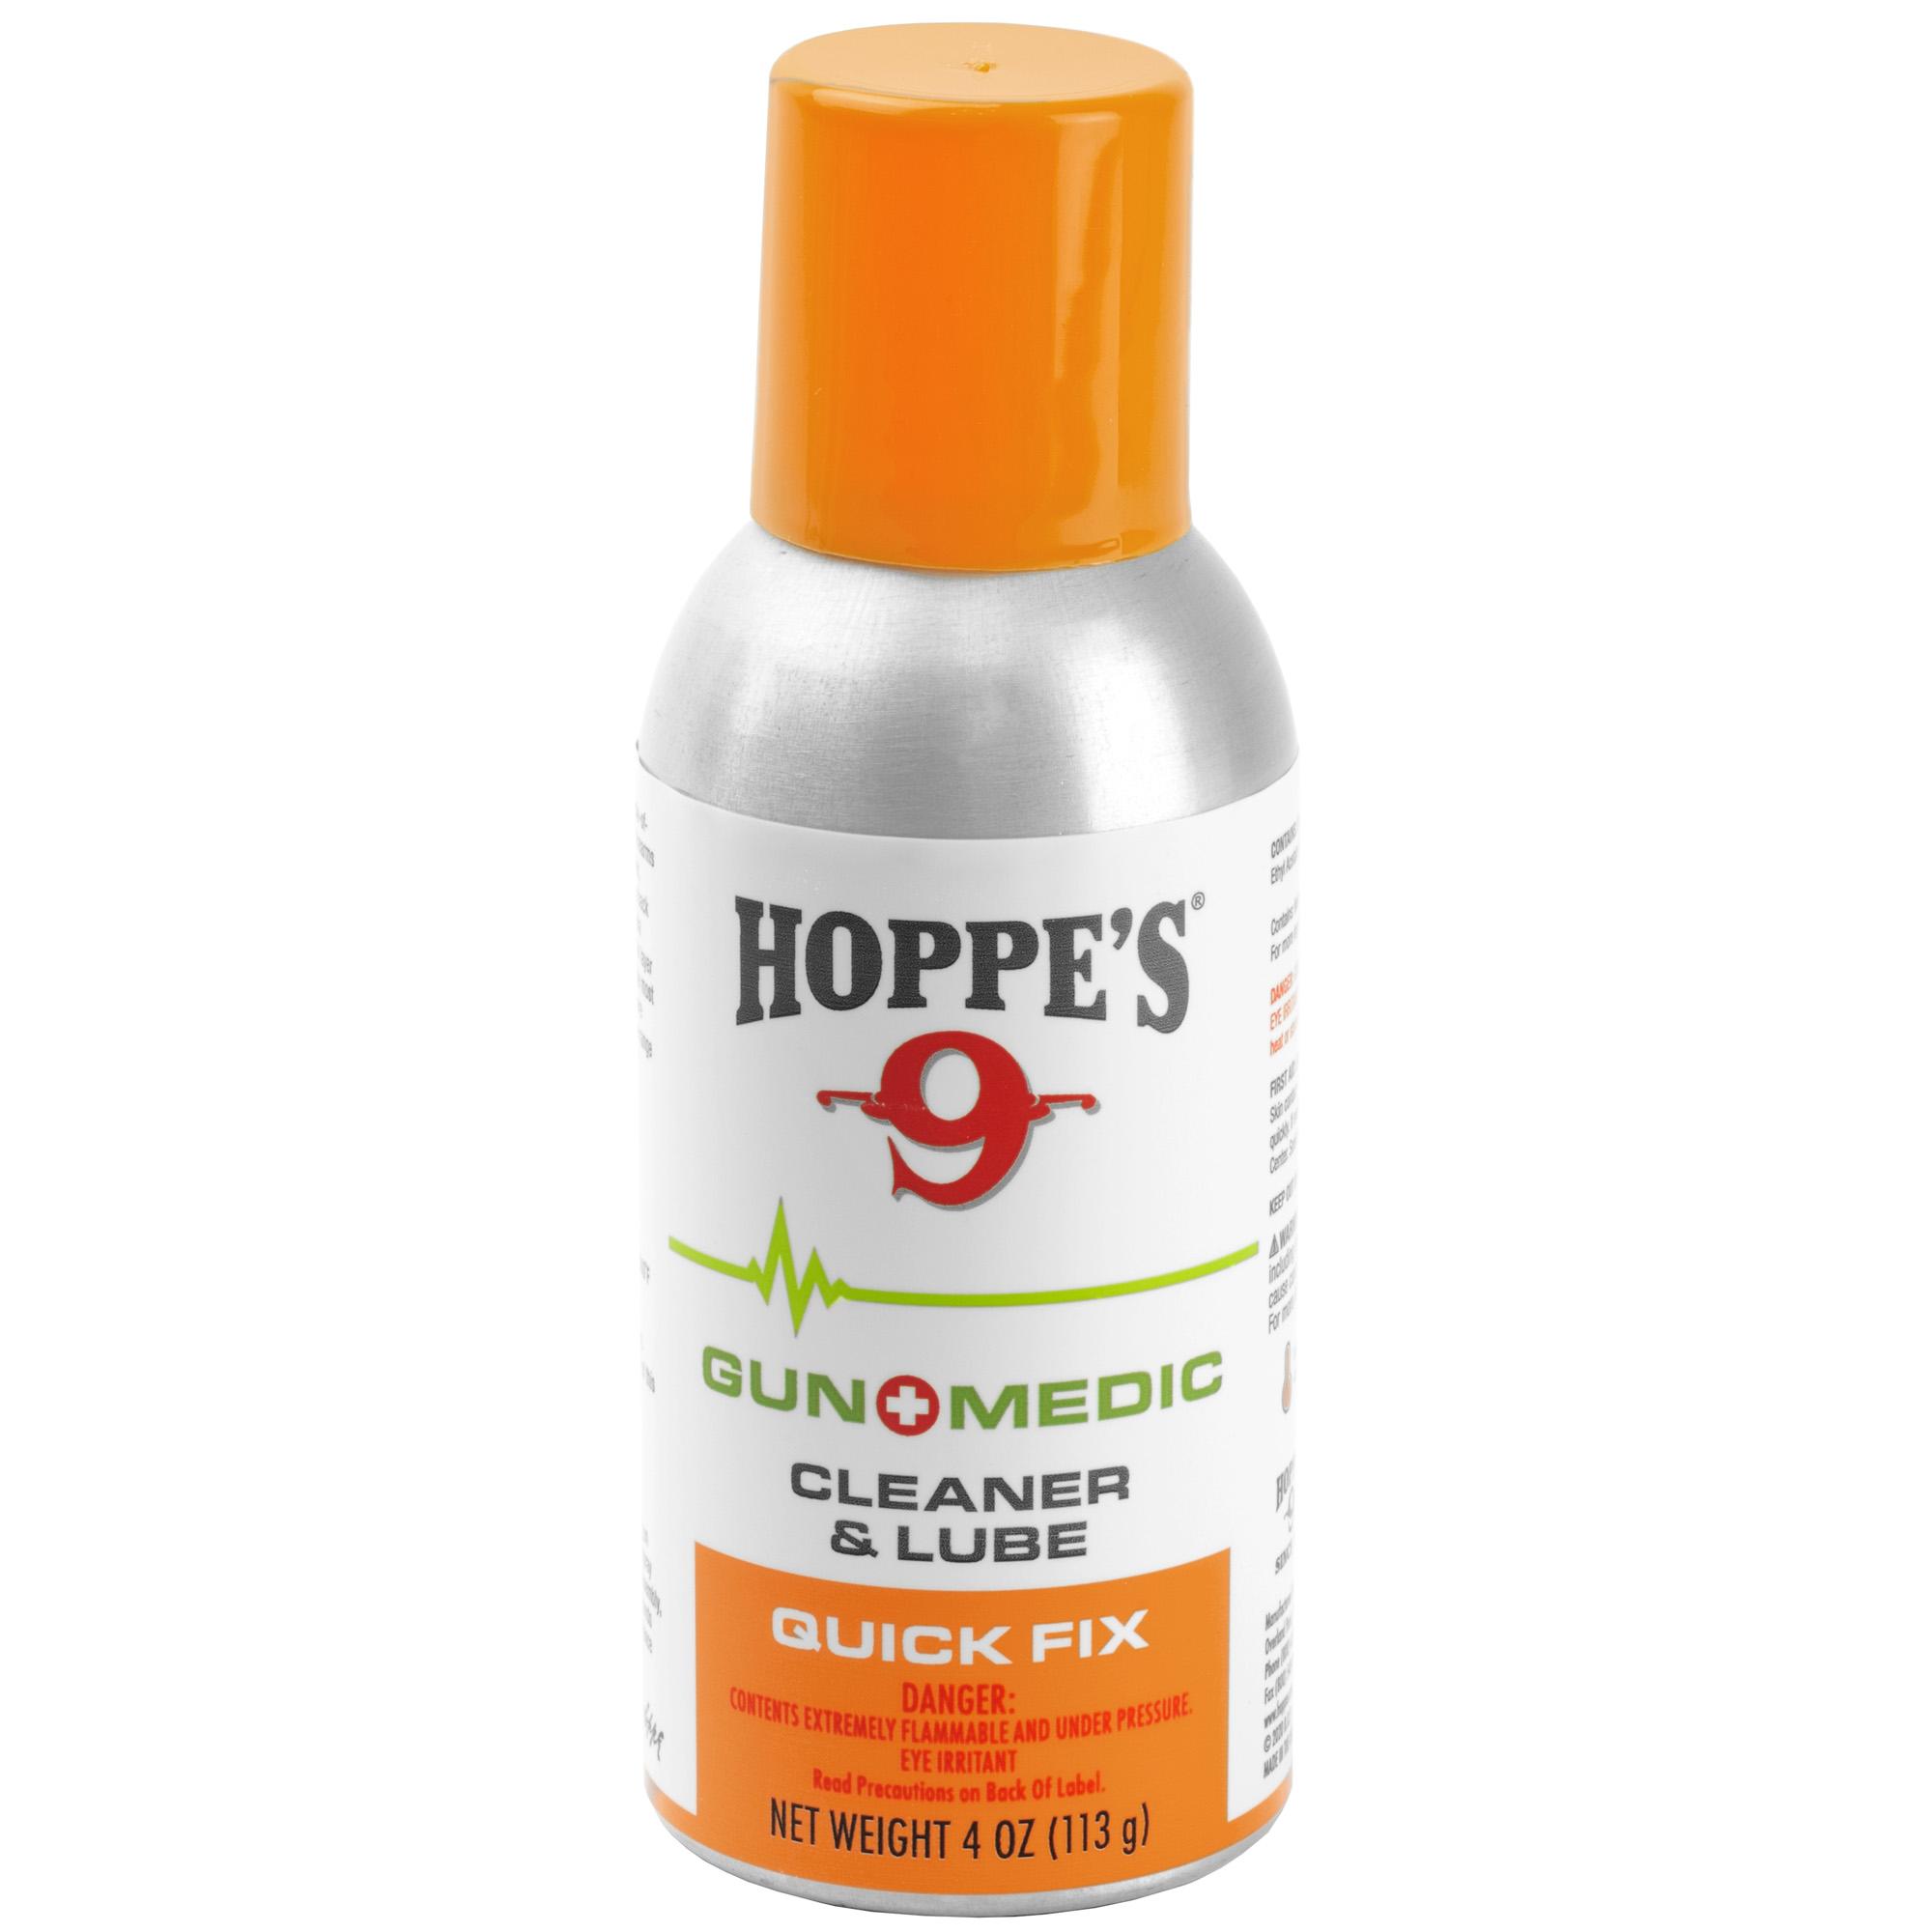 Hoppes Gun Medic Cln/lube 4oz 10pk